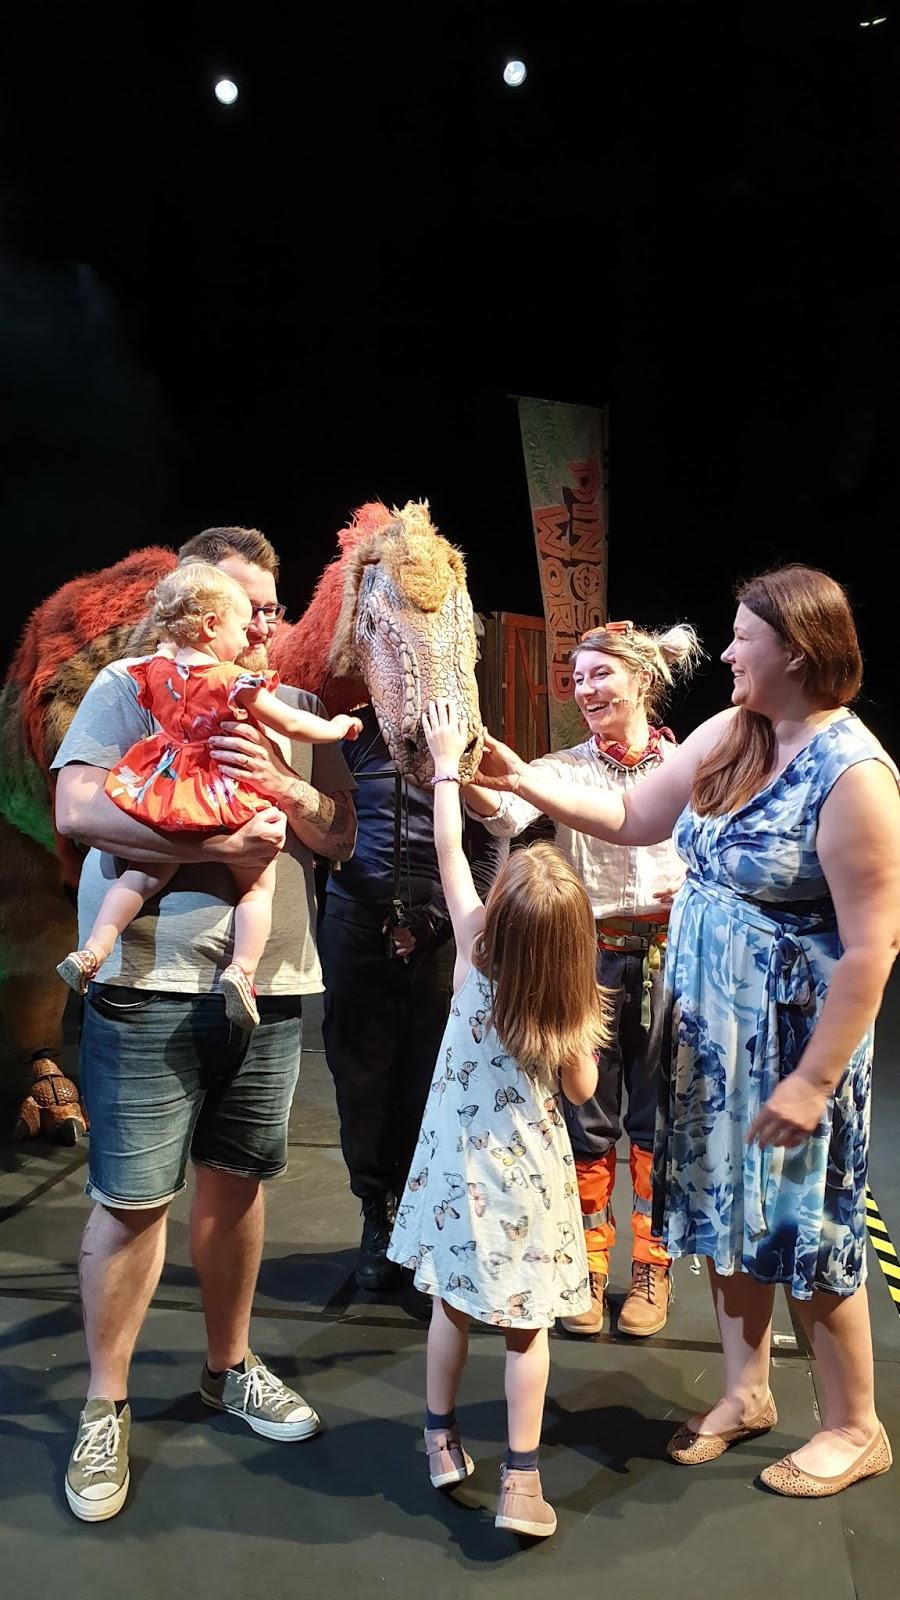 petting a dinosaur as a family